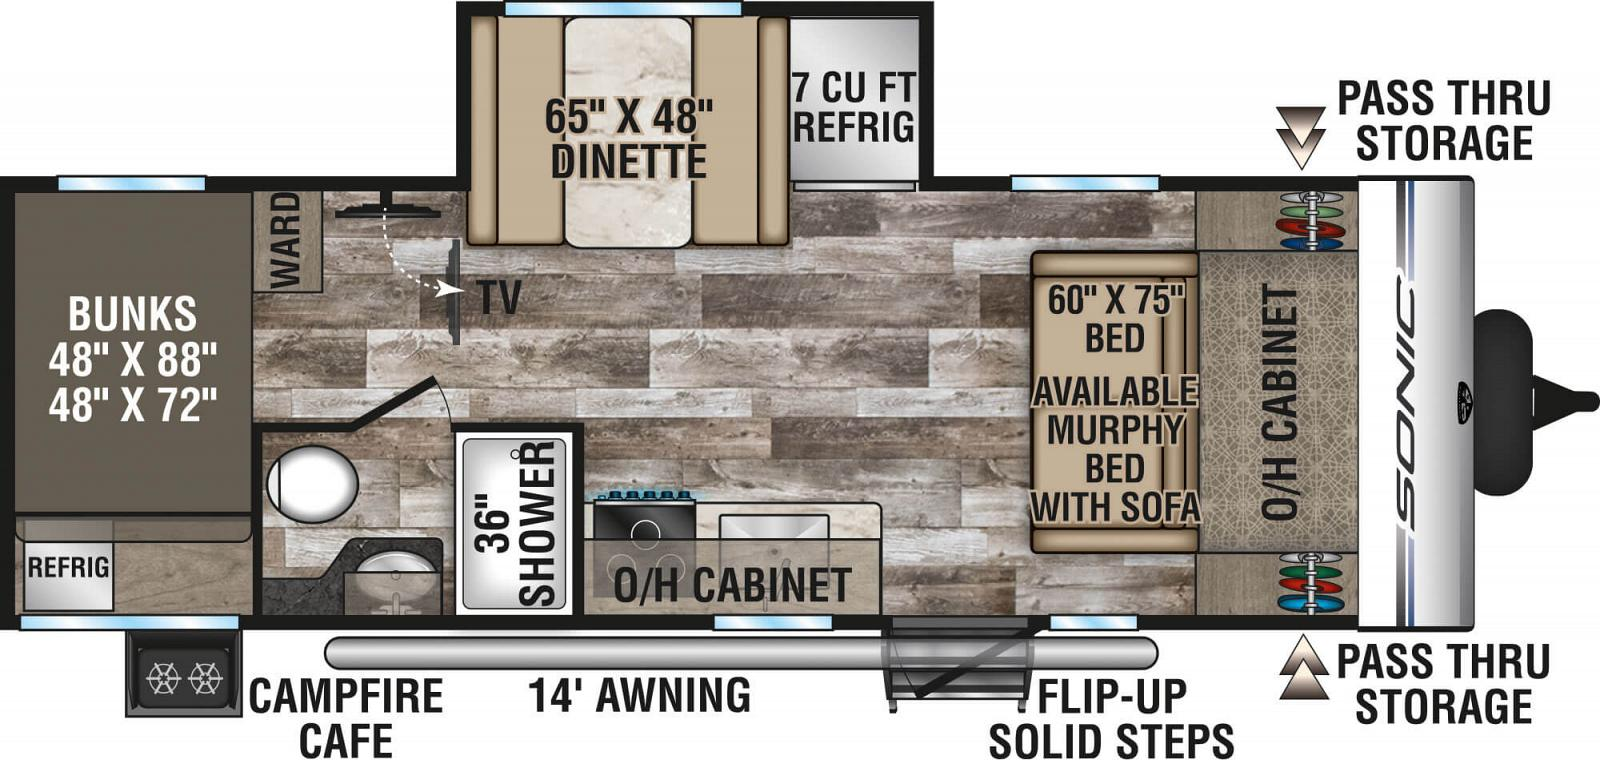 2020 VENTURE SONIC 211VDB (bunks) Floorplan